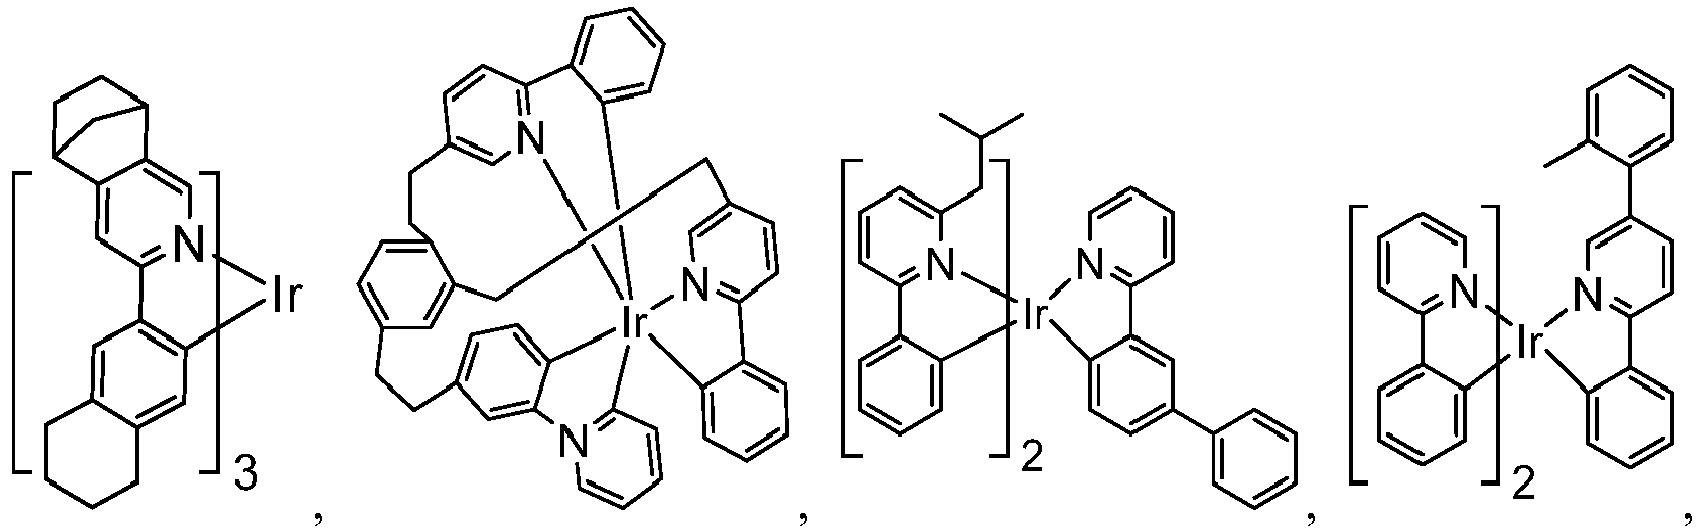 Figure imgb0912